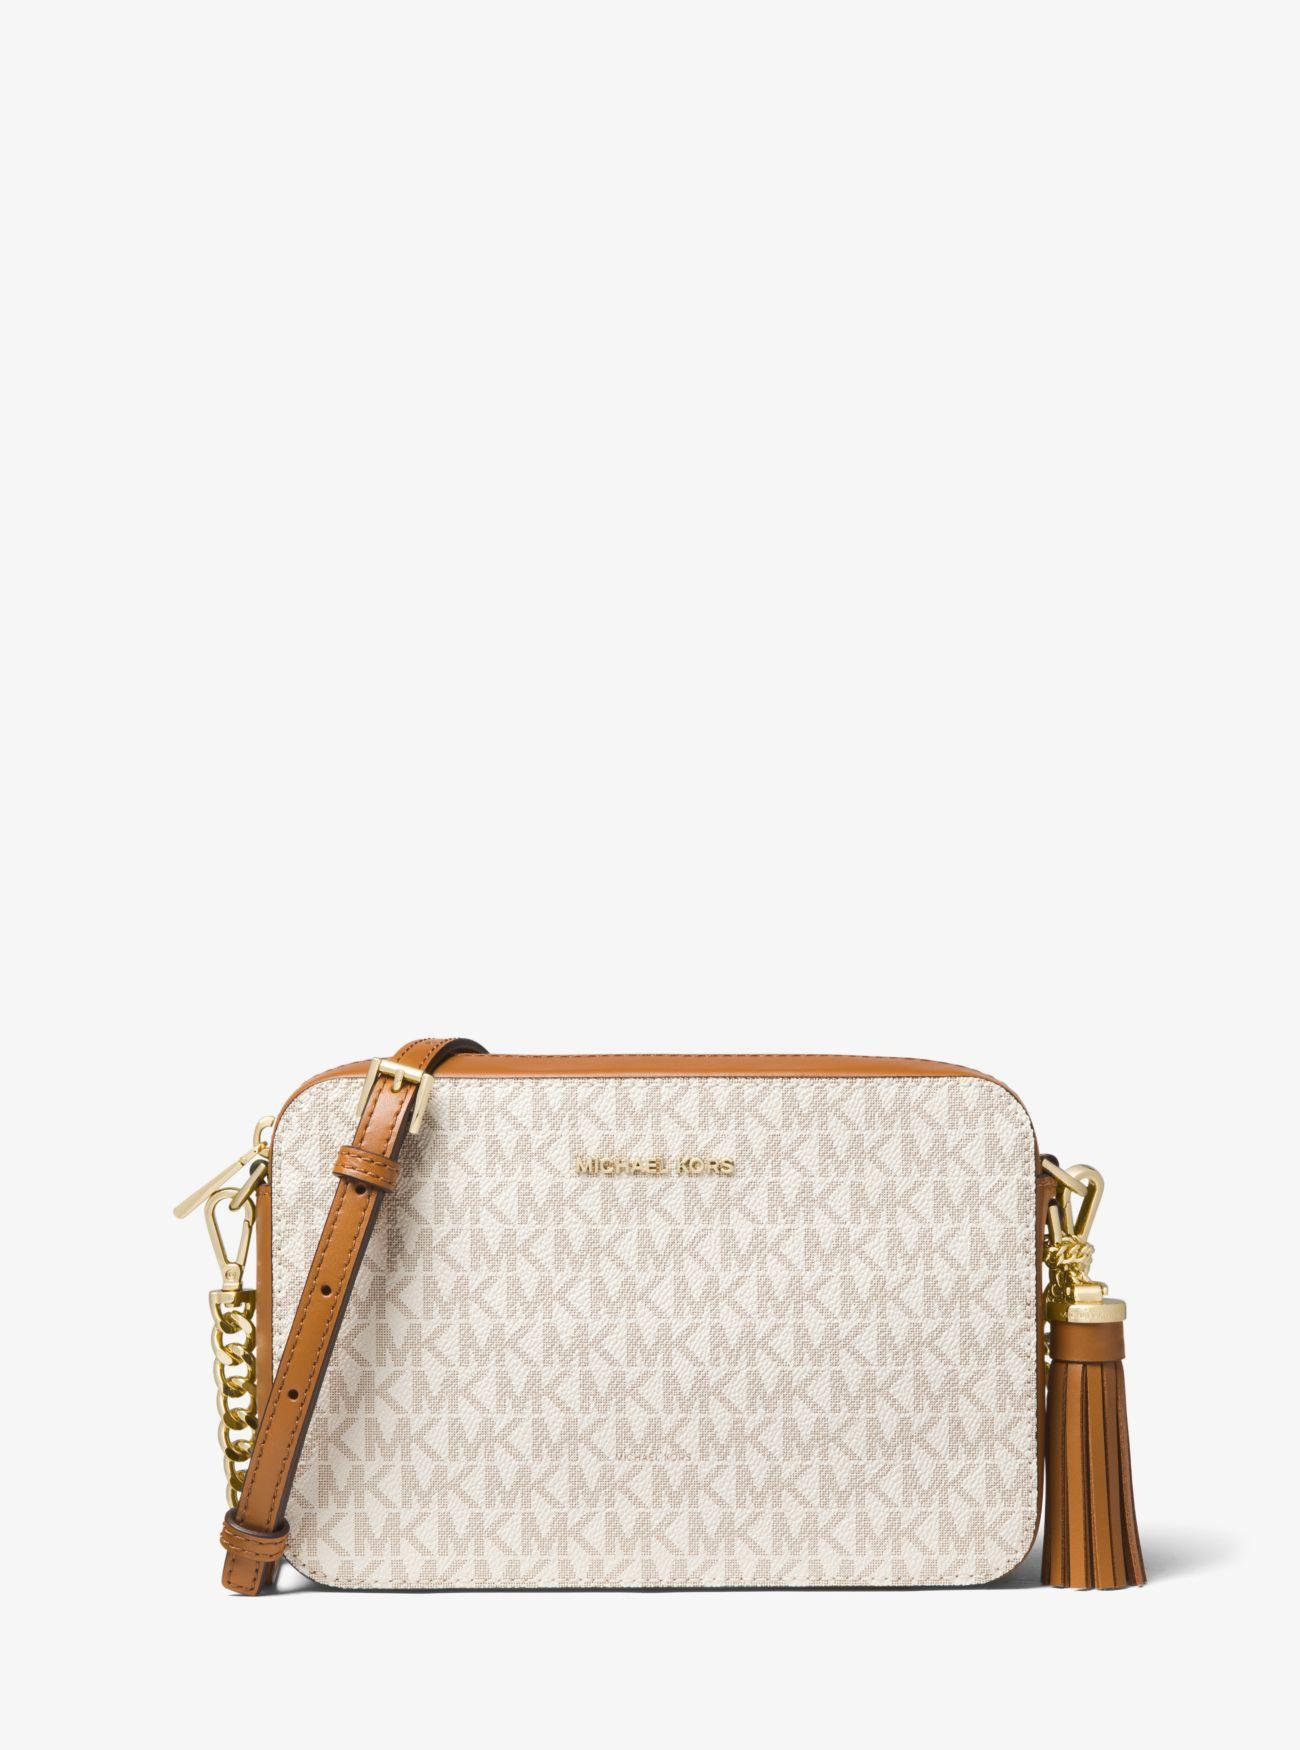 a6b66afd0a57 Michael Kors. Women's Ginny Medium Logo Crossbody Bag